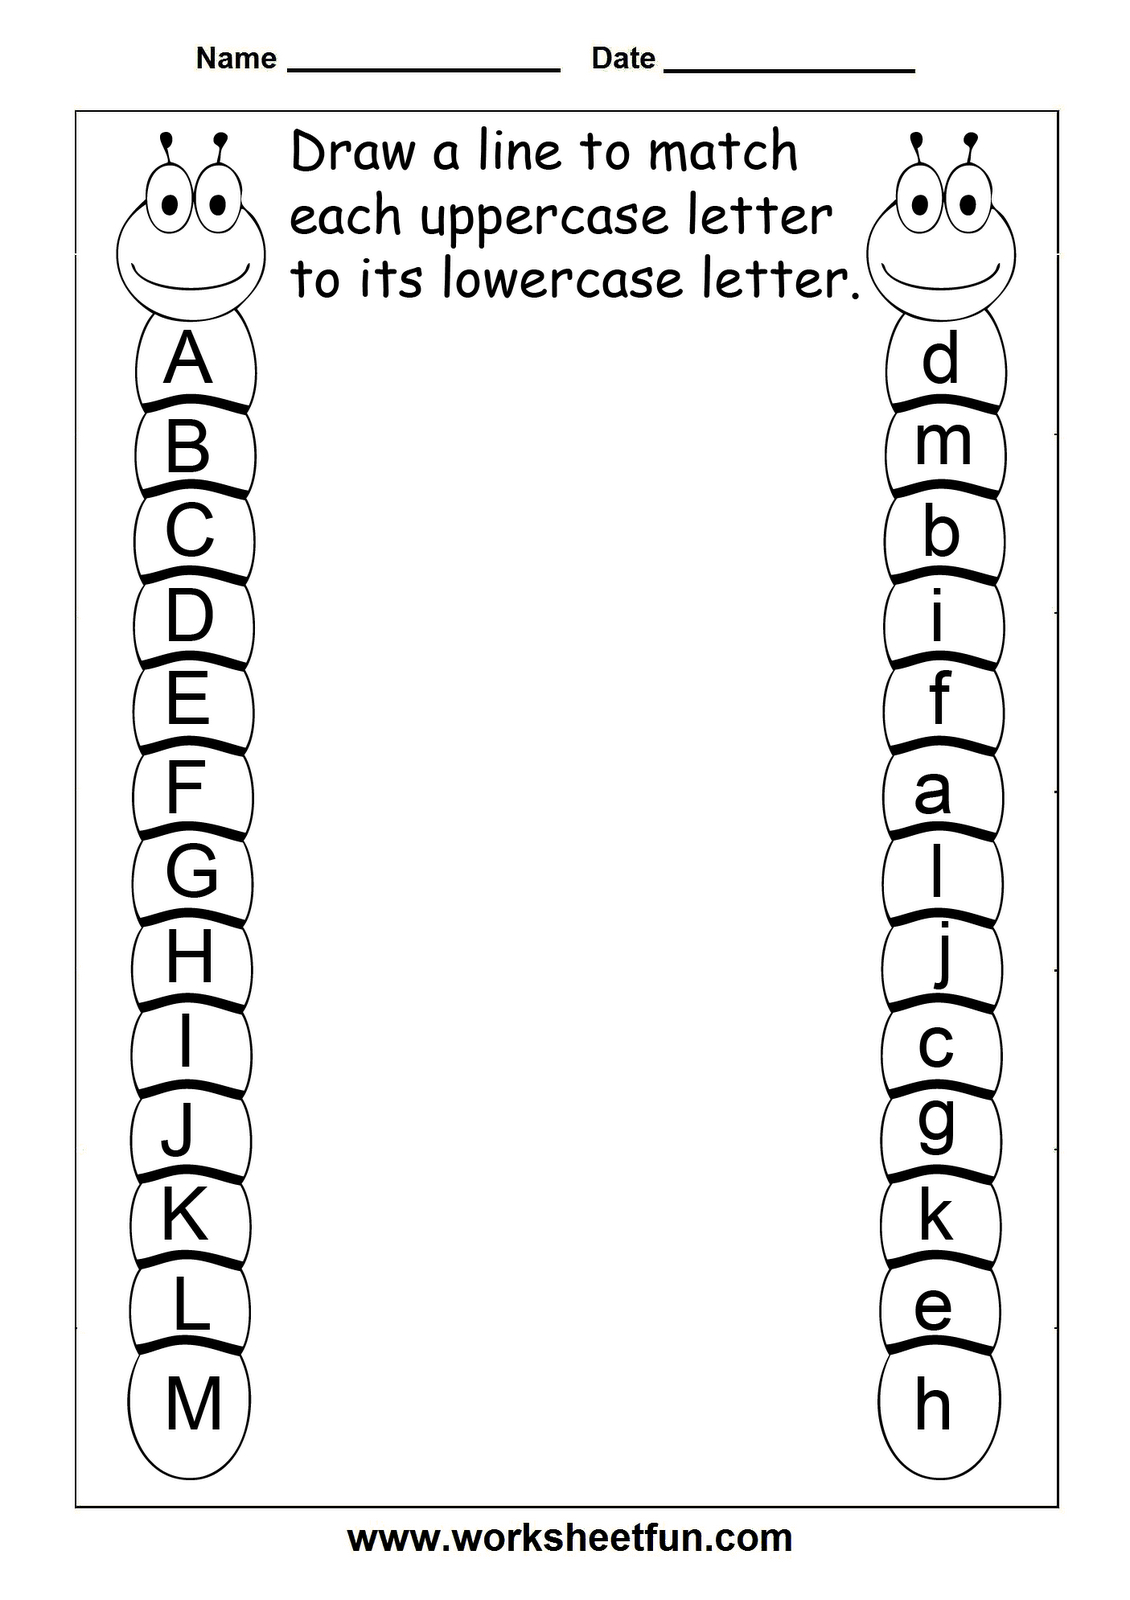 Free Printable Worksheets | Kids | Kinder Printables pertaining to Grade 1 Alphabet Worksheets